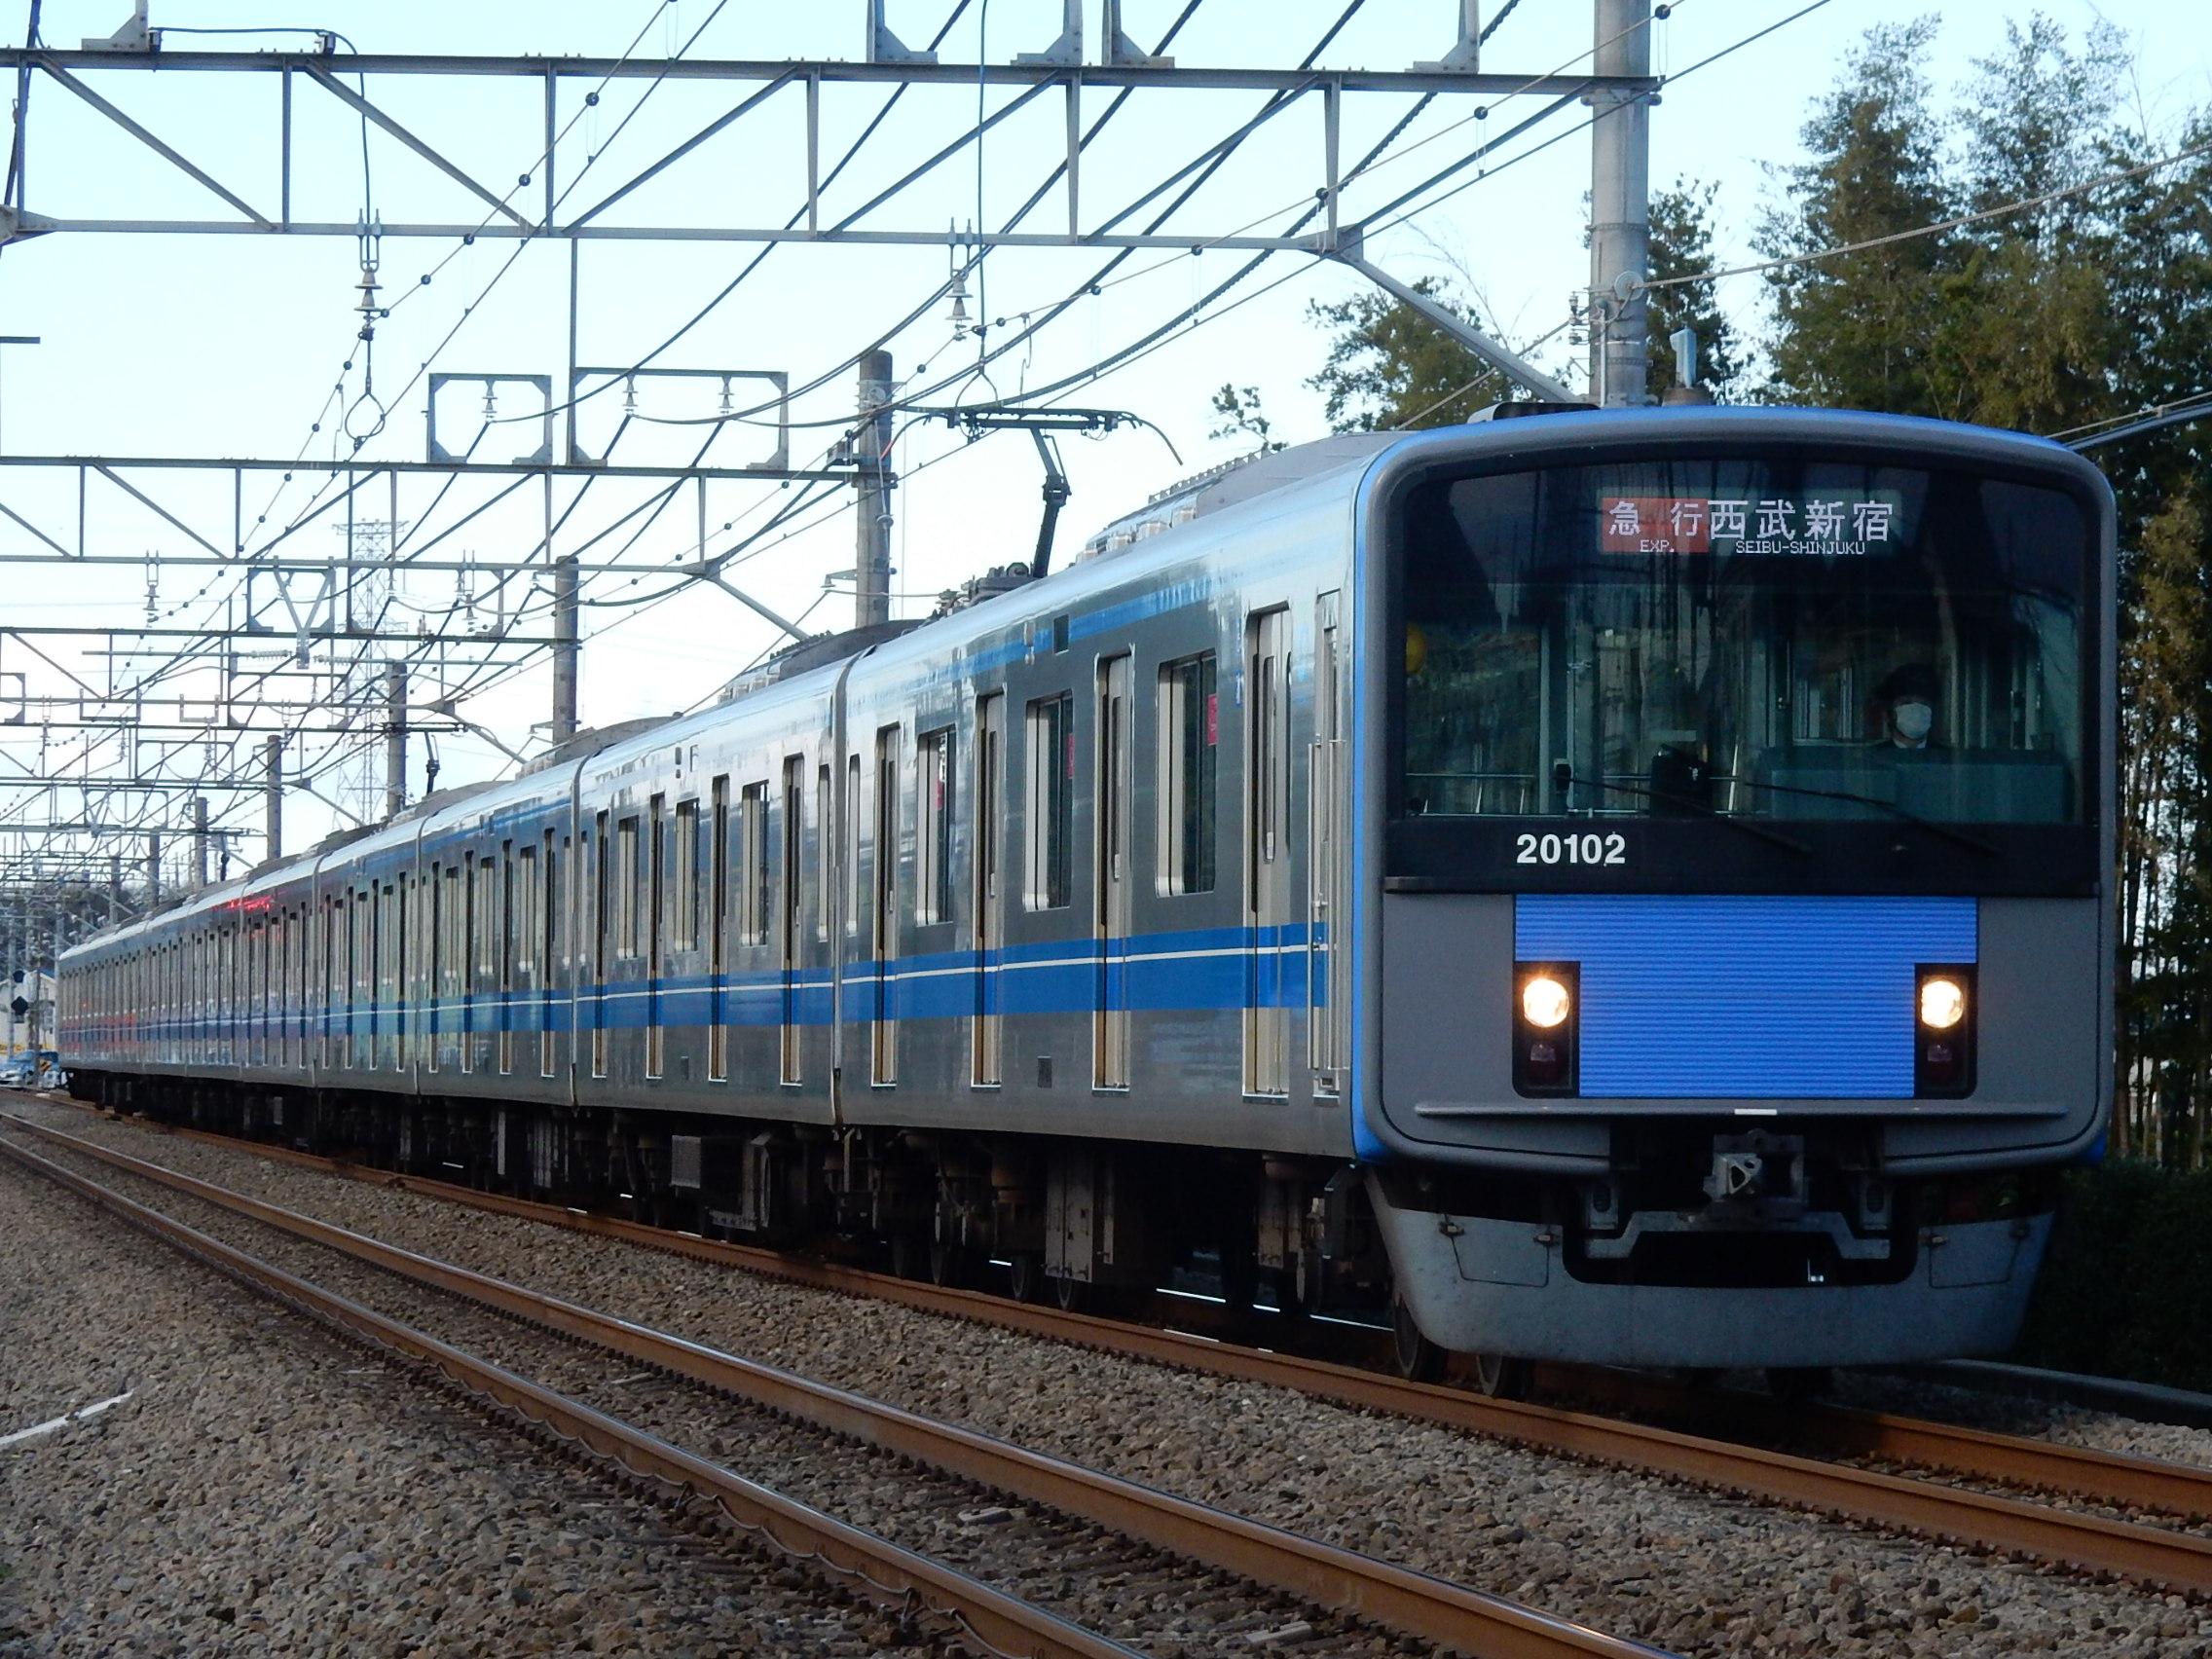 RSCN9385.jpg